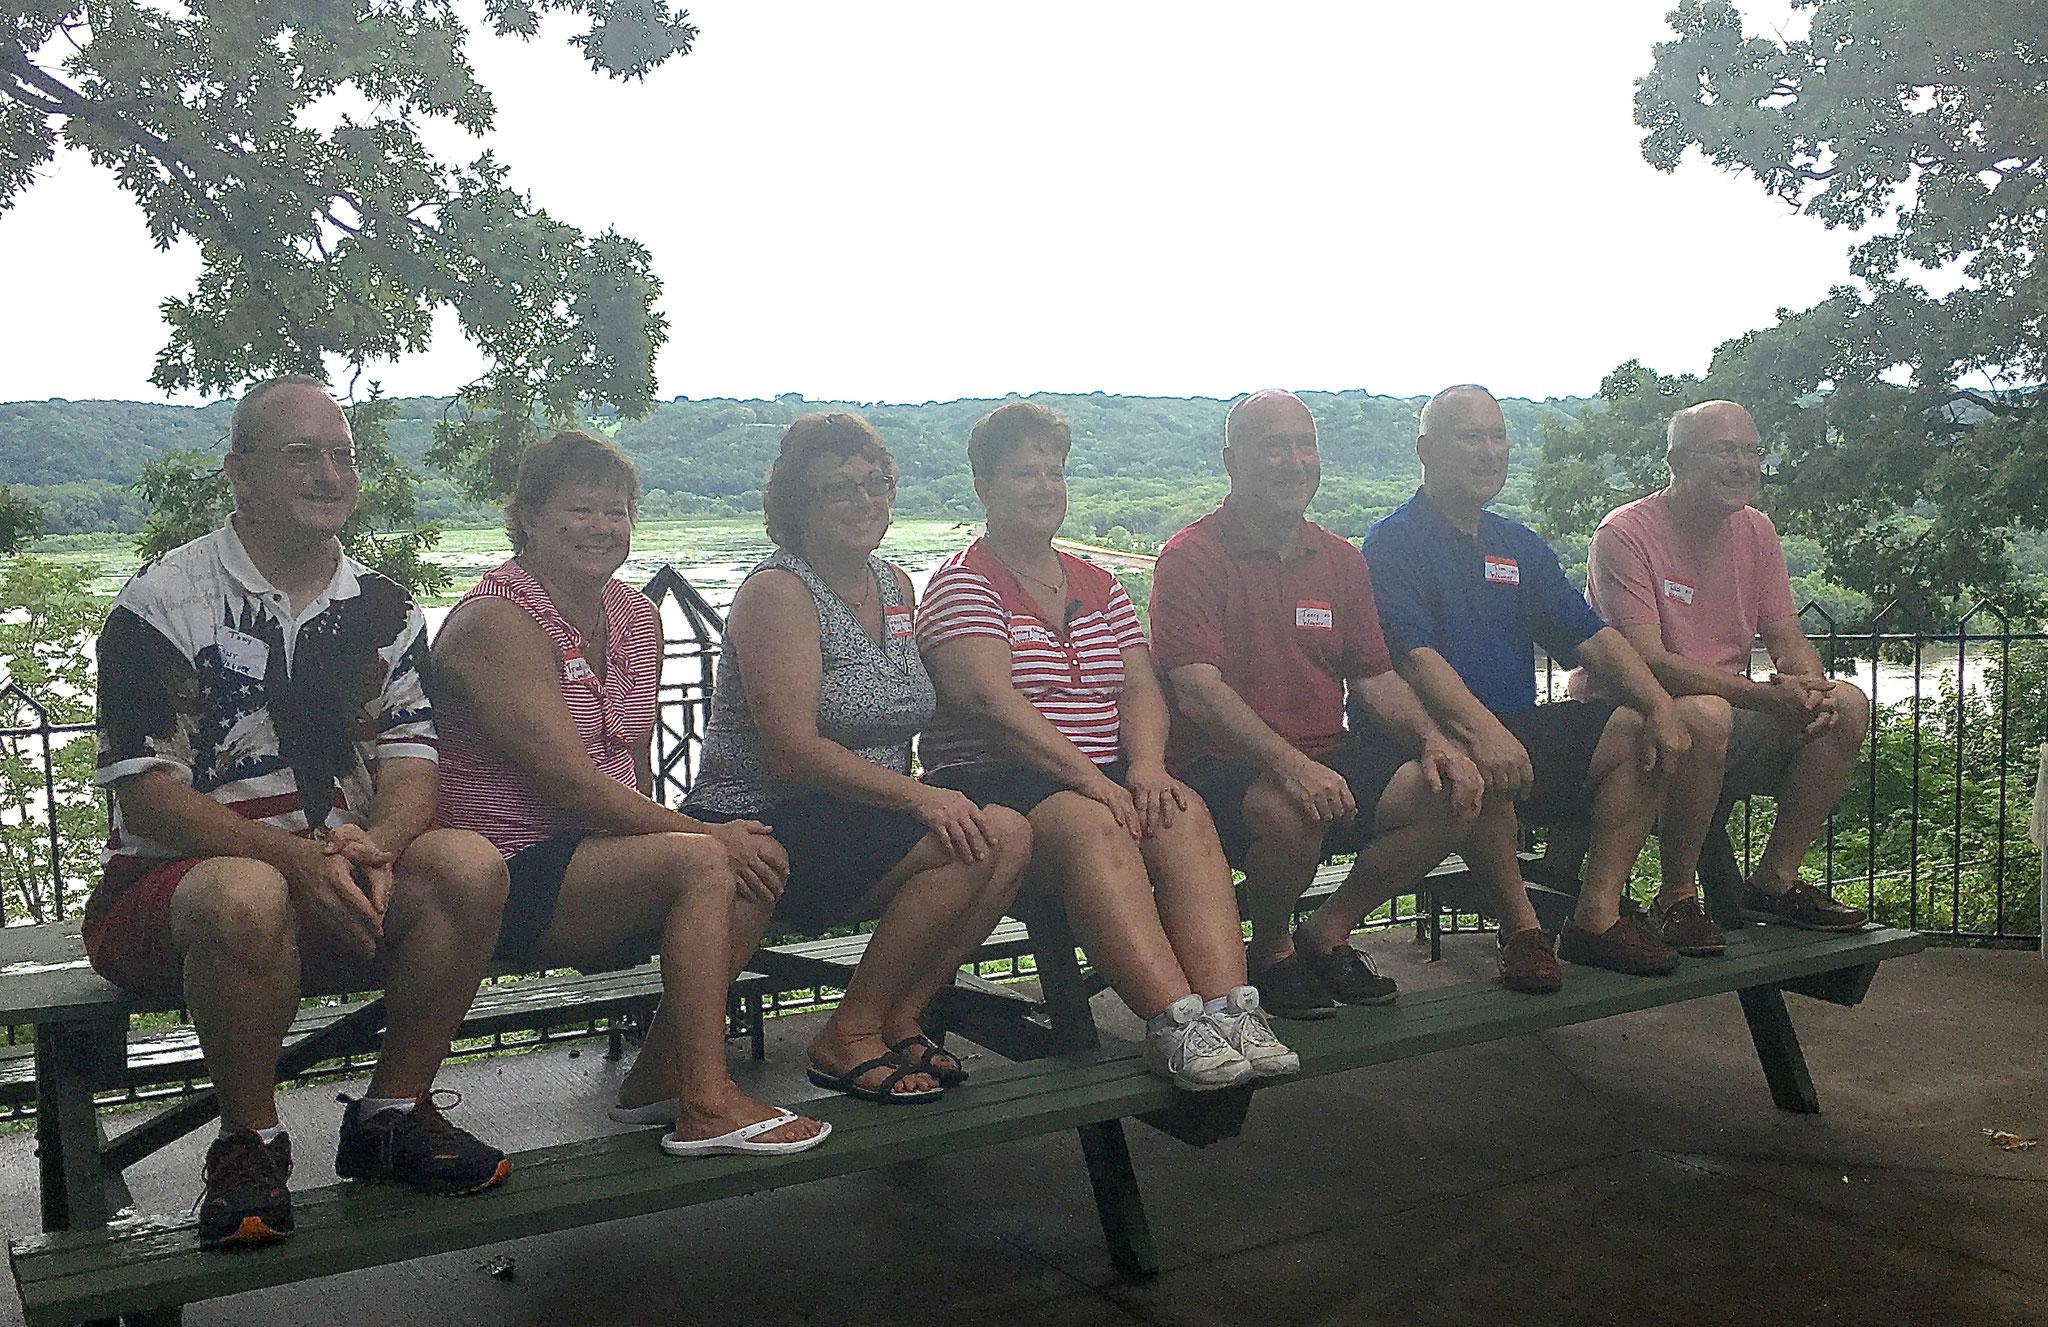 Tony, Tracy, Trudy, Tammy, Terry, Tim and Tom Wagner